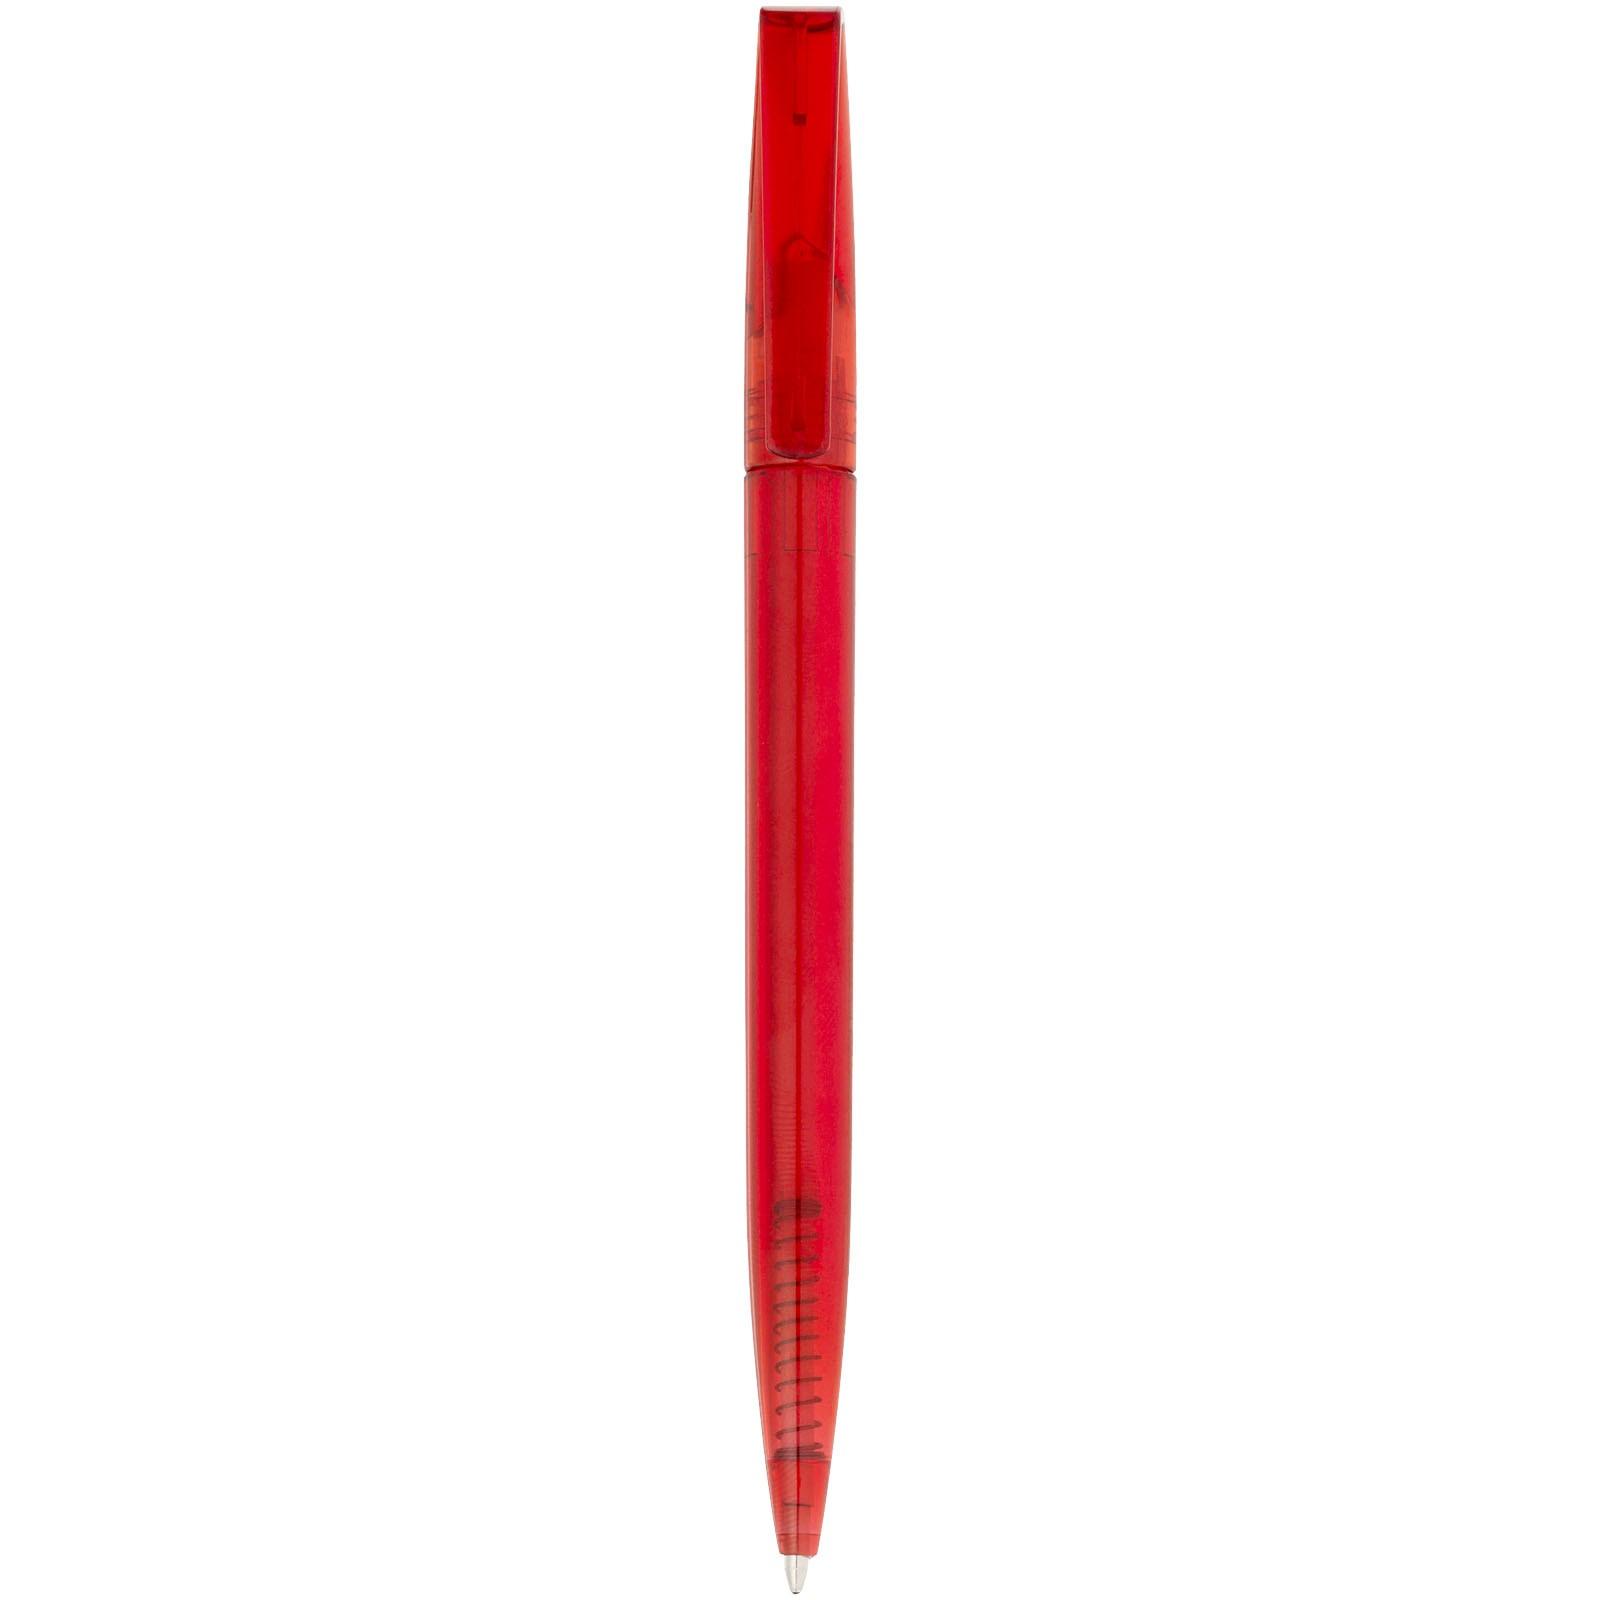 London ballpoint pen - Red